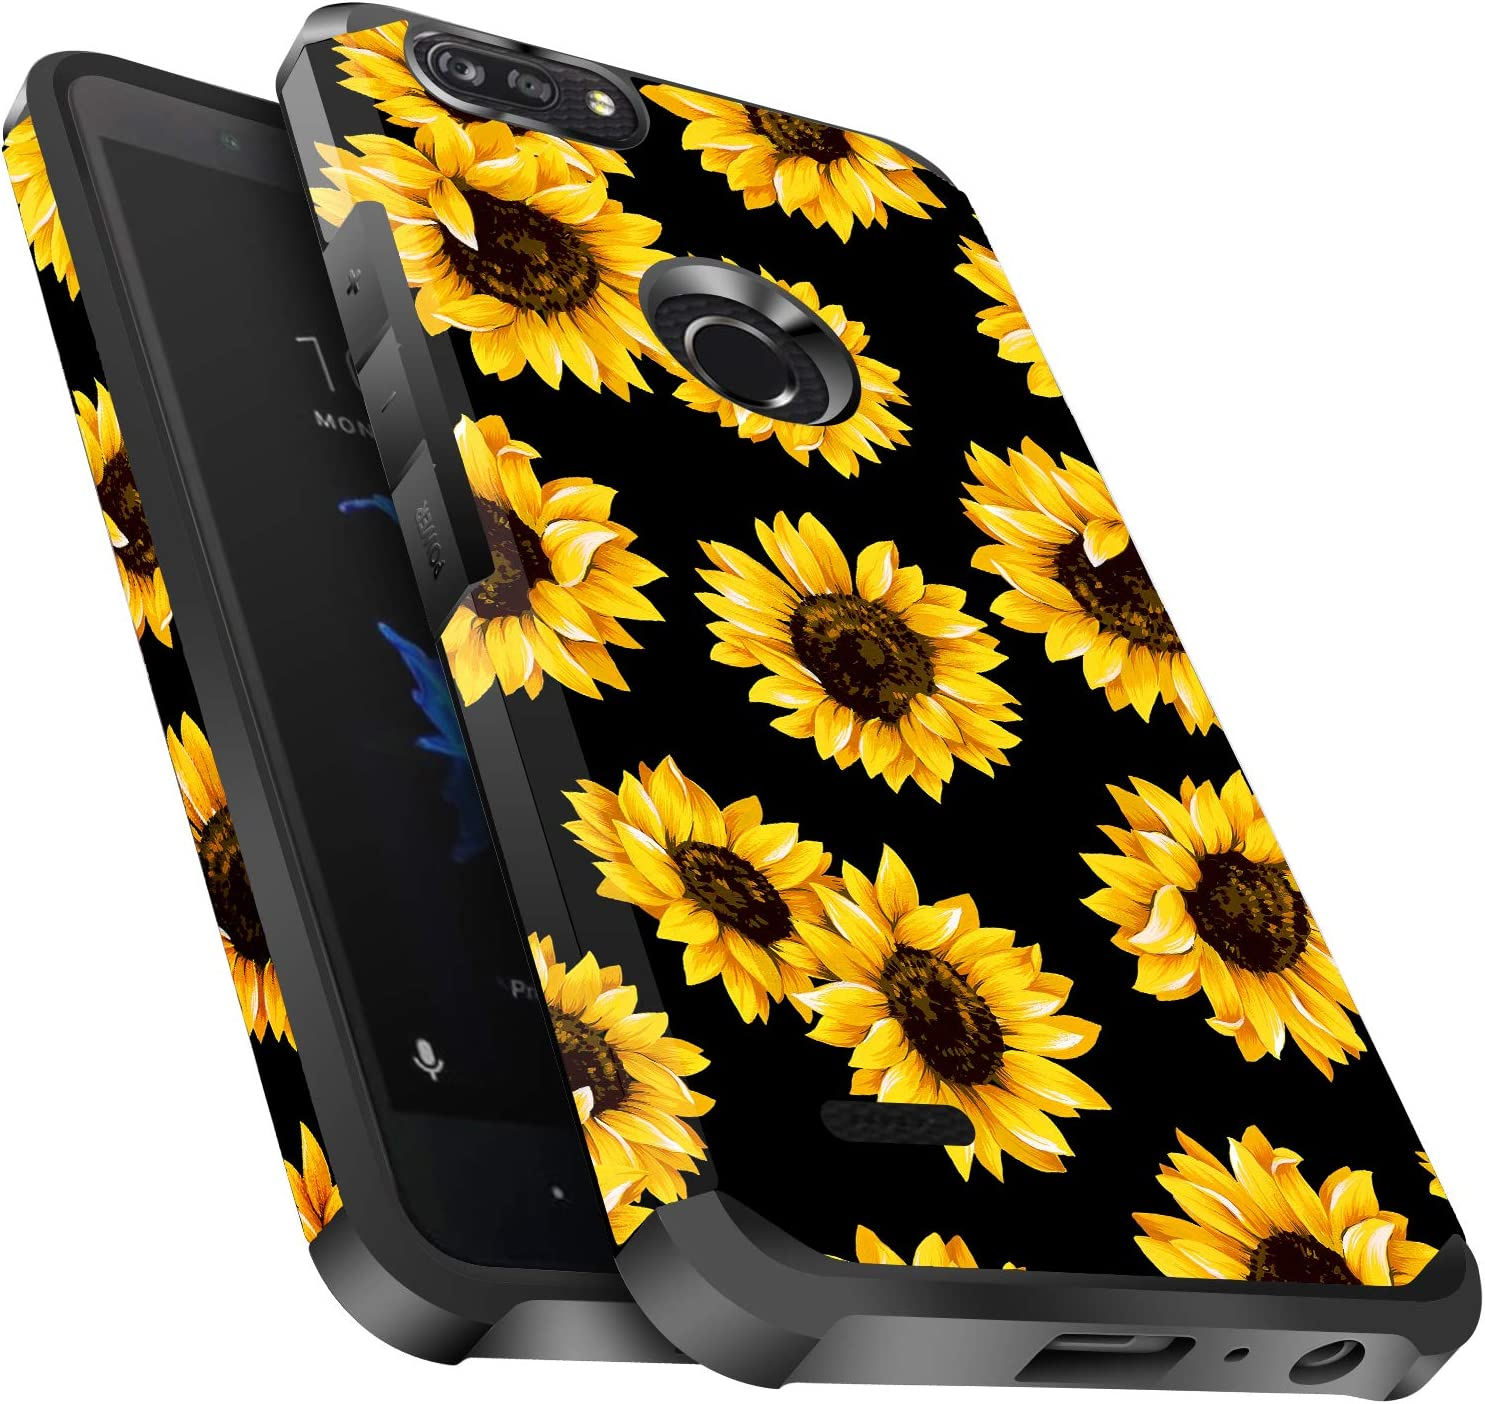 ZTE Blade Z Max Case, ZTE Blade Zmax Pro 2 Case, ZTE Sequoia Case, Miss Arts Slim Anti-Scratch Kit with [Drop Protection] Dual Layer Protective Cover Case for ZTE Z982 -Sunflower/Black